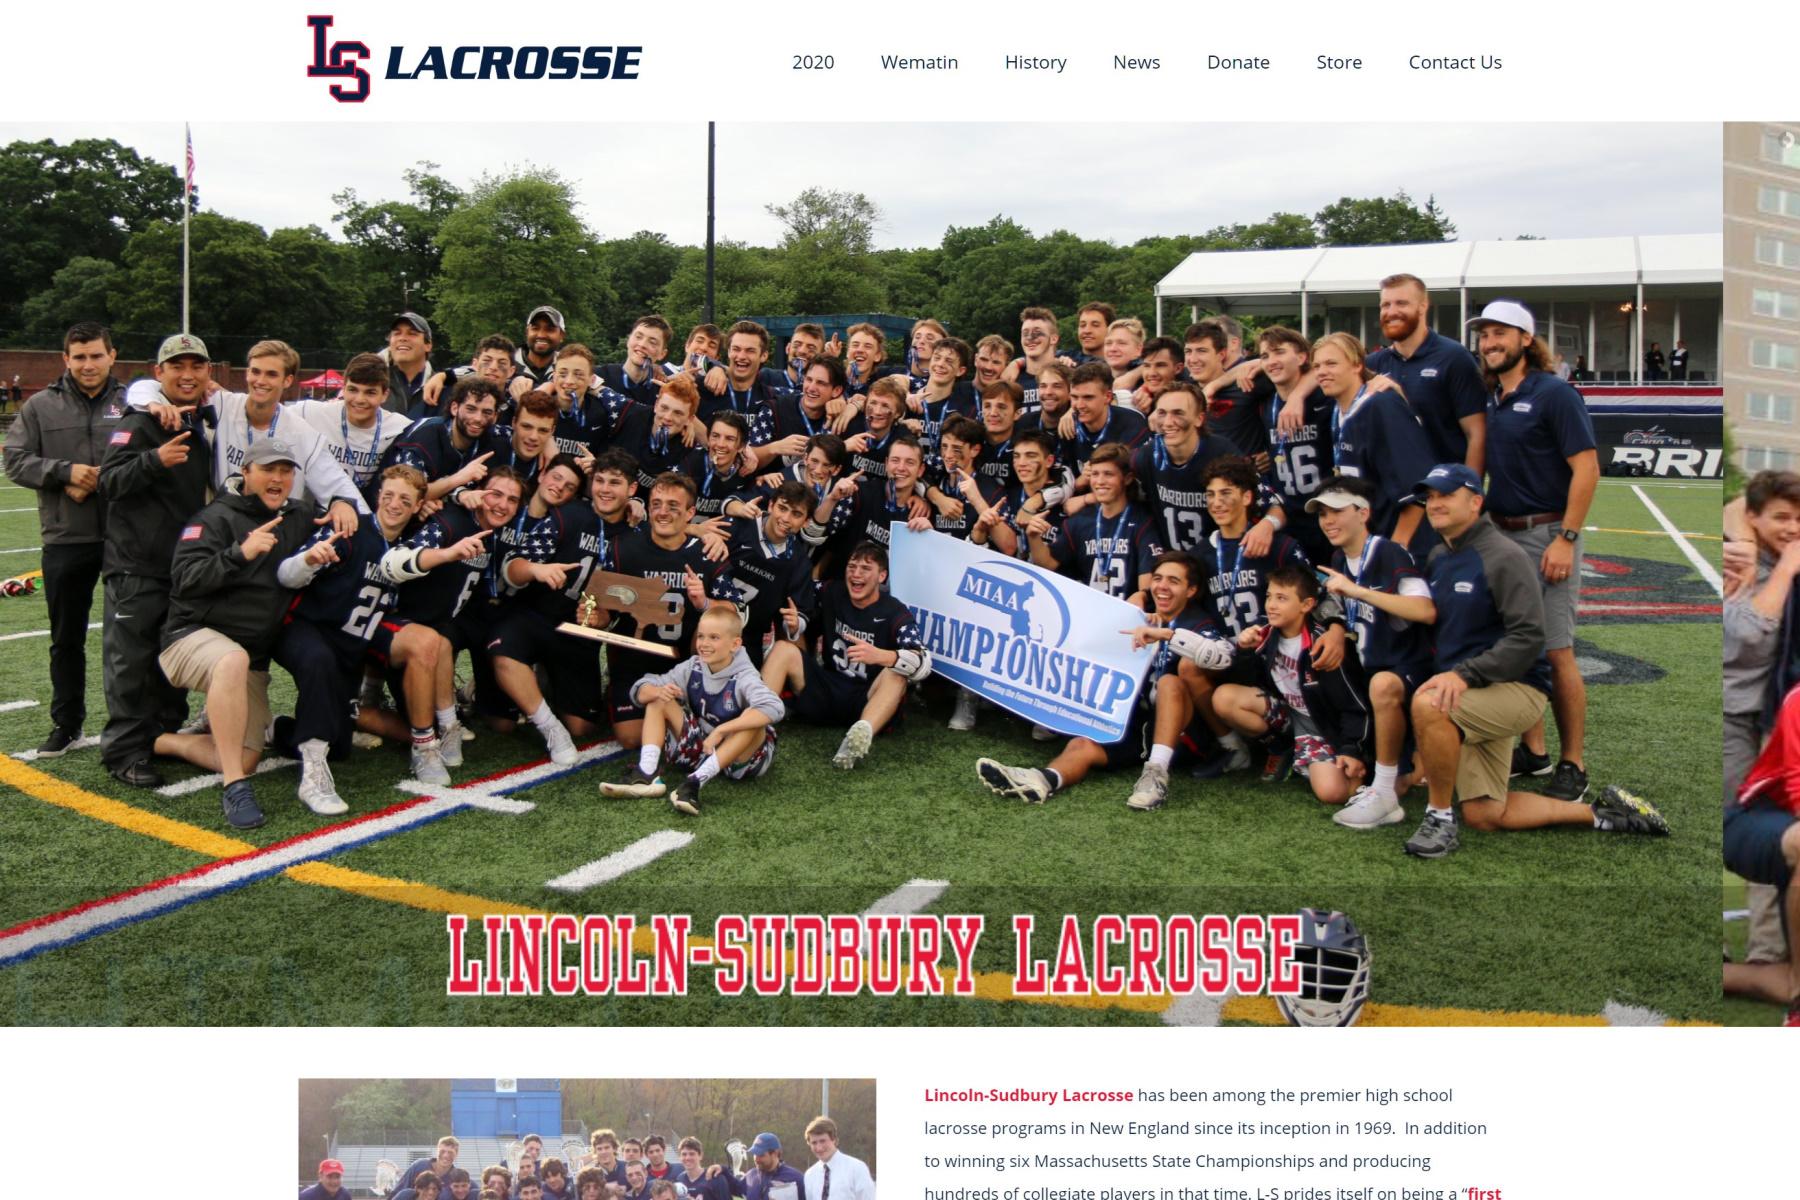 Lincoln-Sudbury Lacrosse